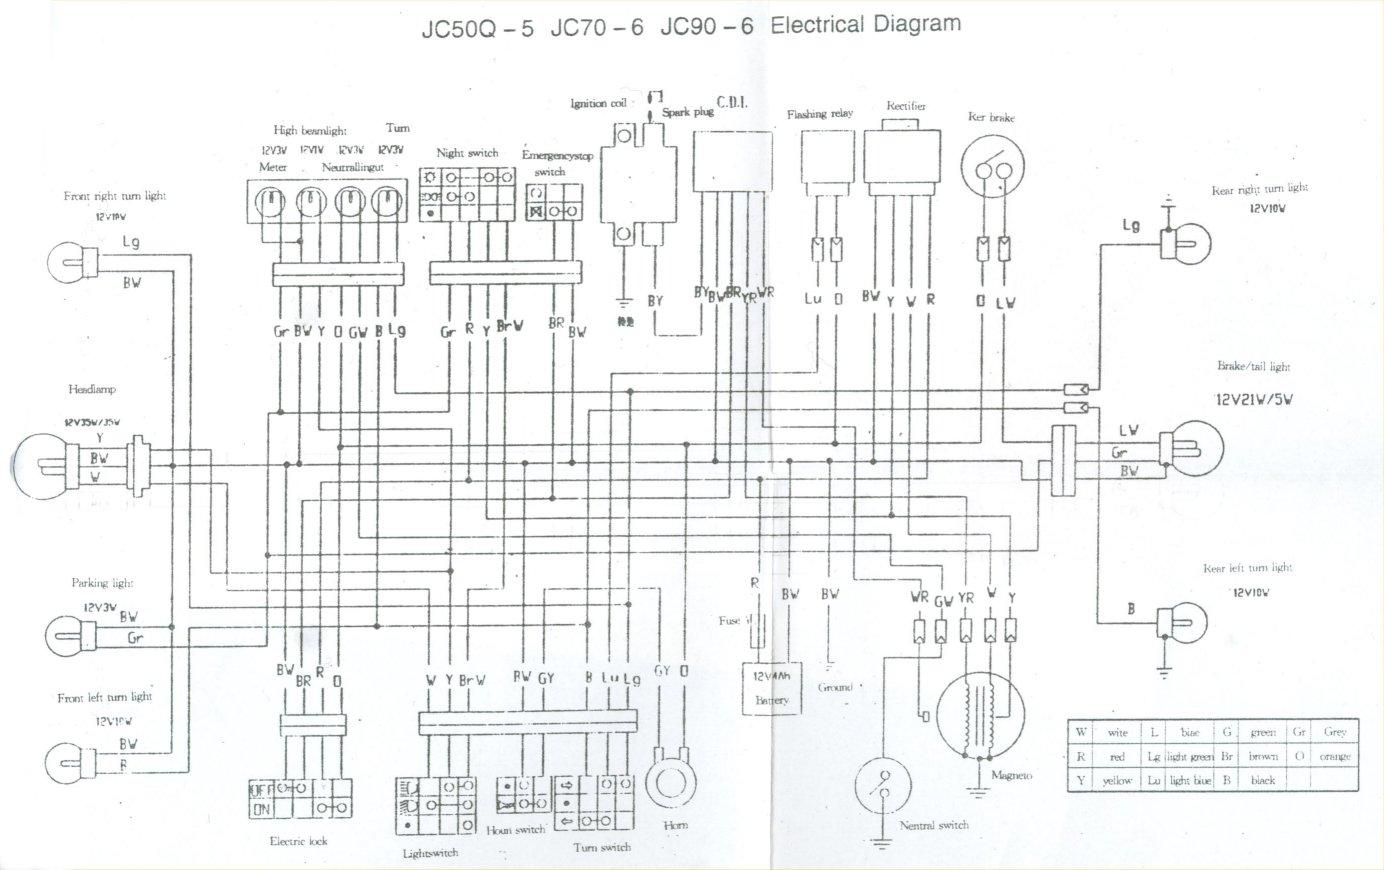 1971 Honda Cb500 Wiring Diagram 1978 Honda Cb550k Wiring